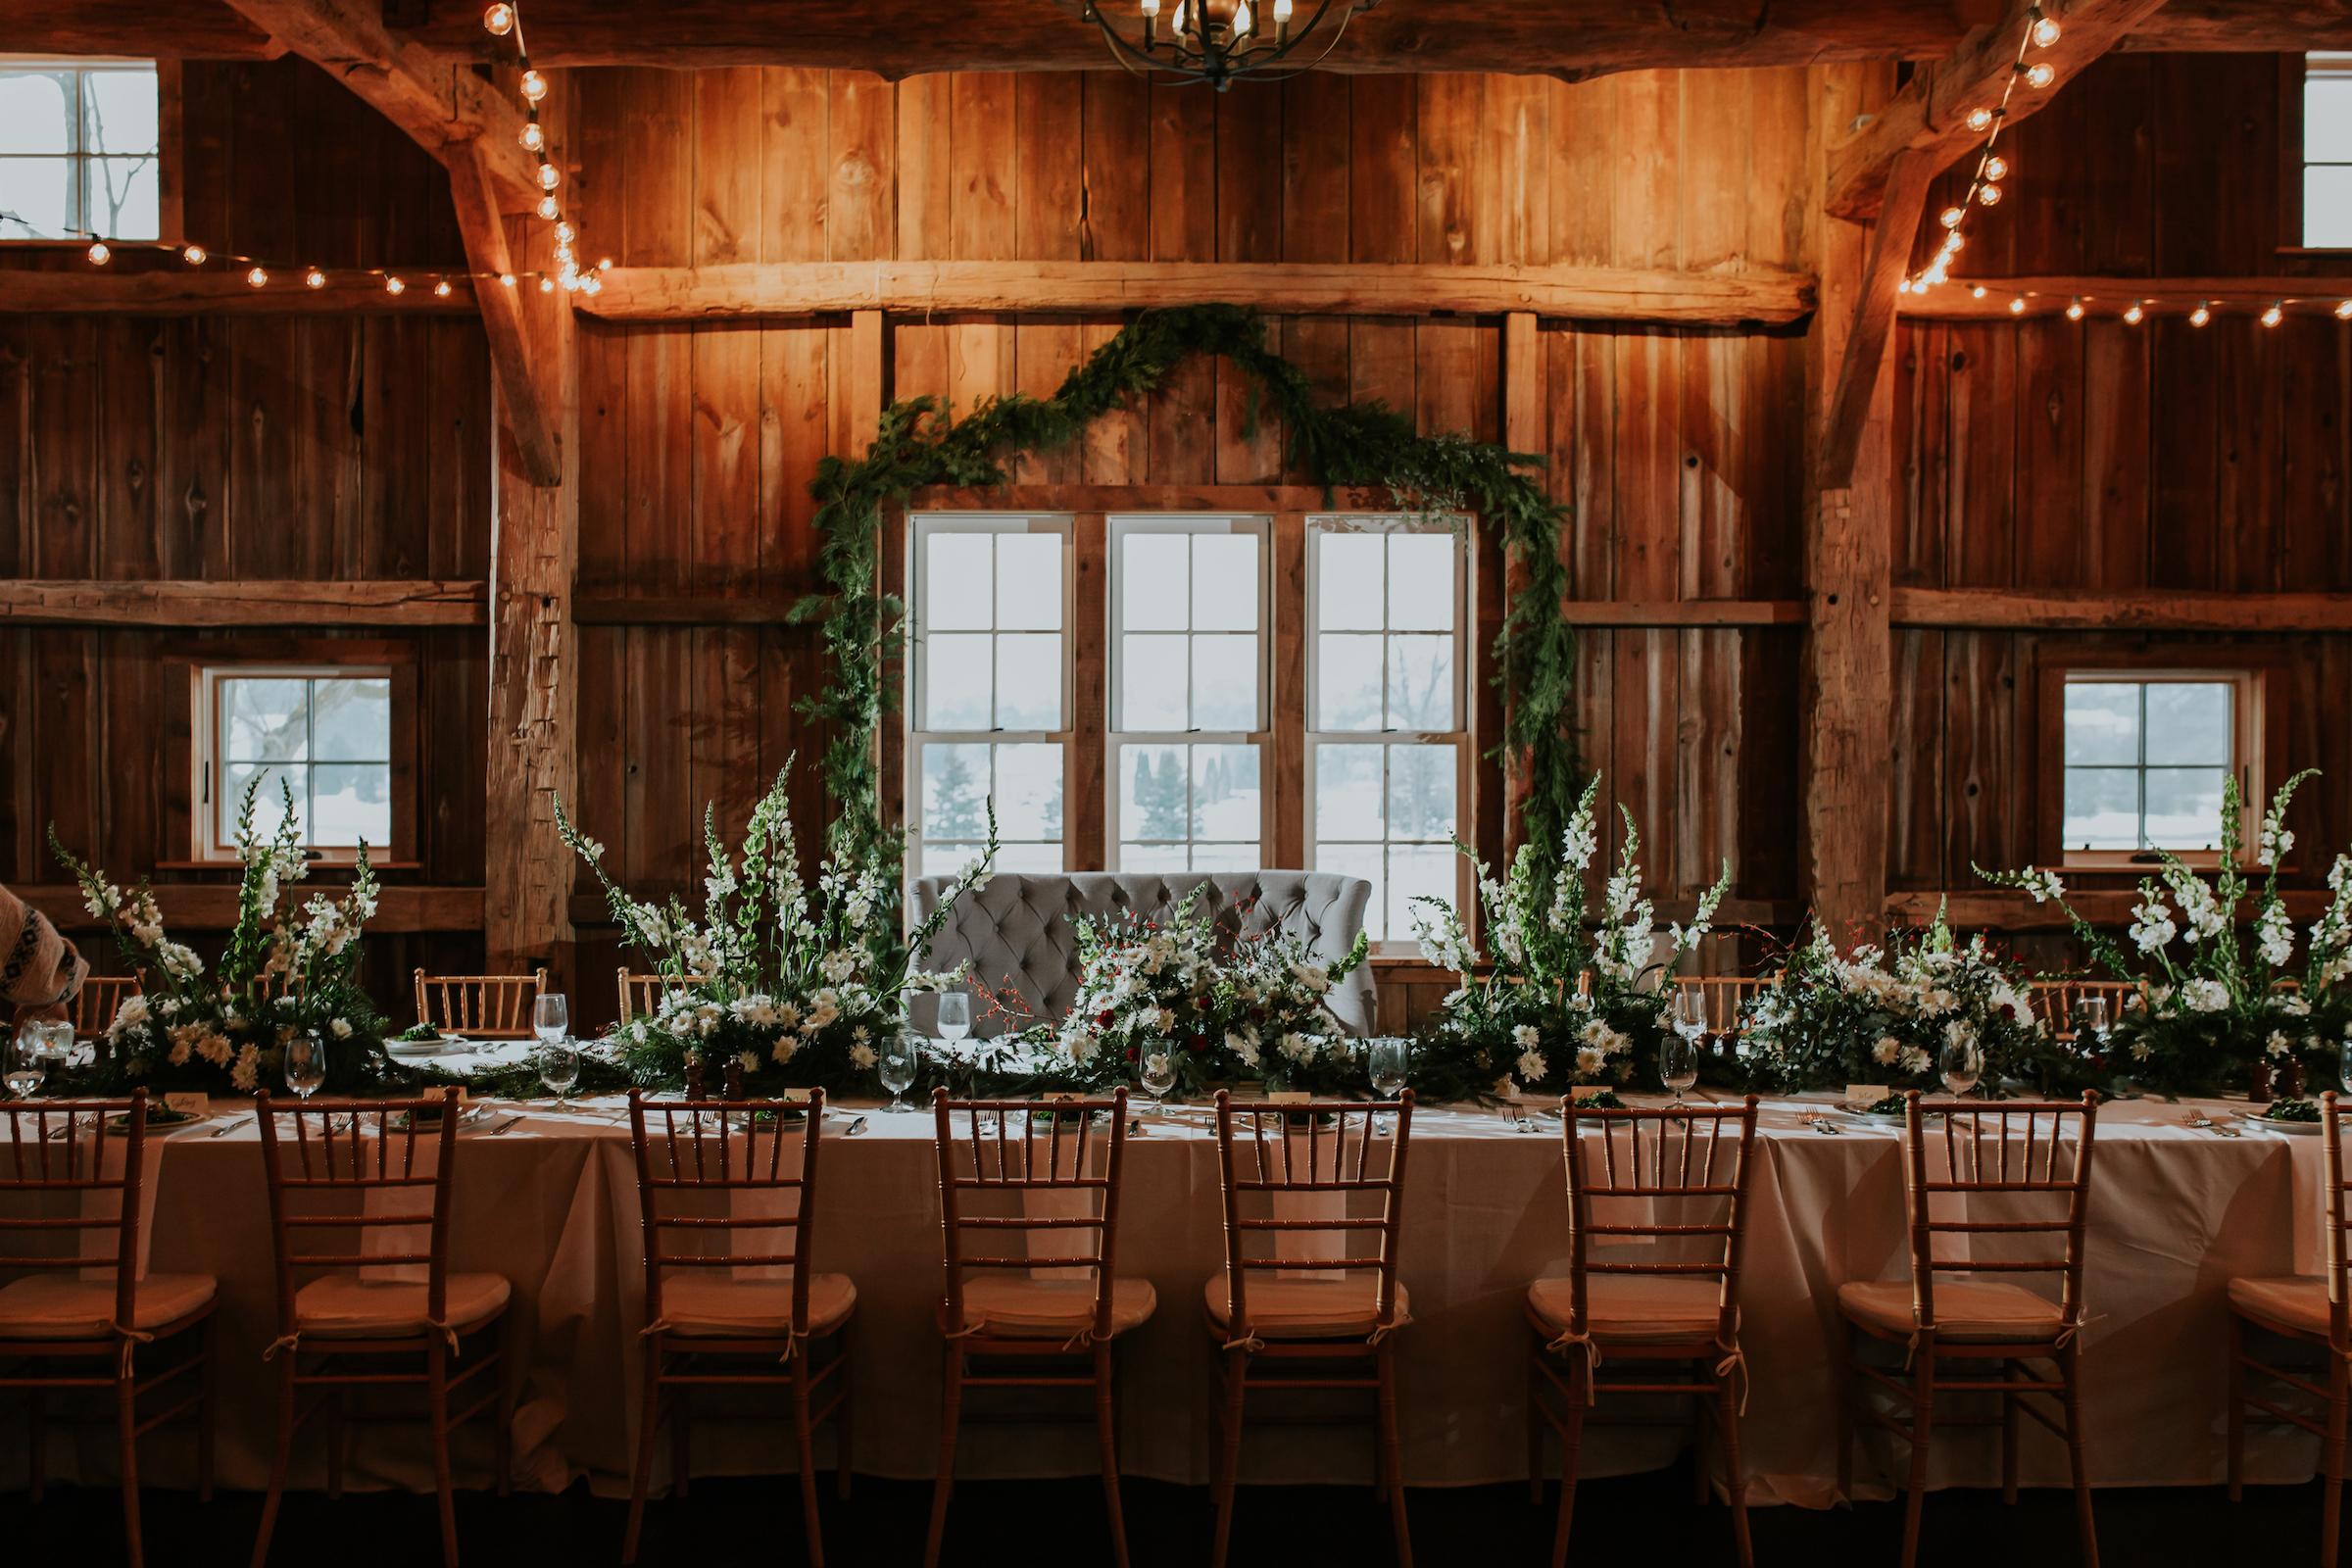 Winter Weddings in Michigan - Intimate Winter Wedding Venues